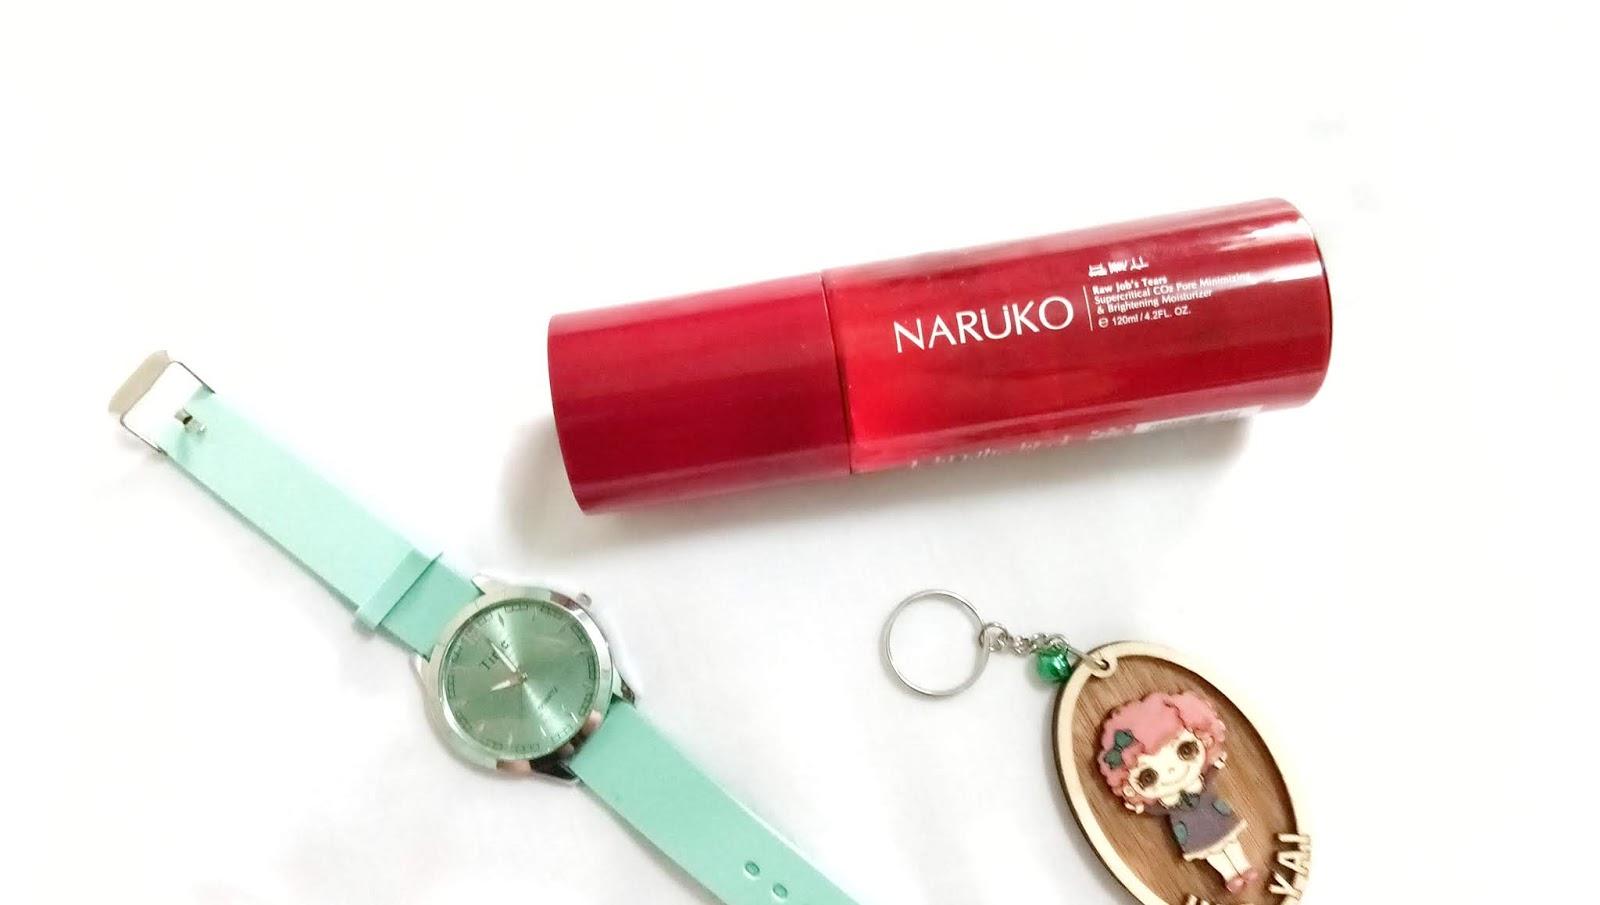 Naruko Raw Job's Tears Supercritical CO2 Pore Minimizing & Brightening Moisturizer Review